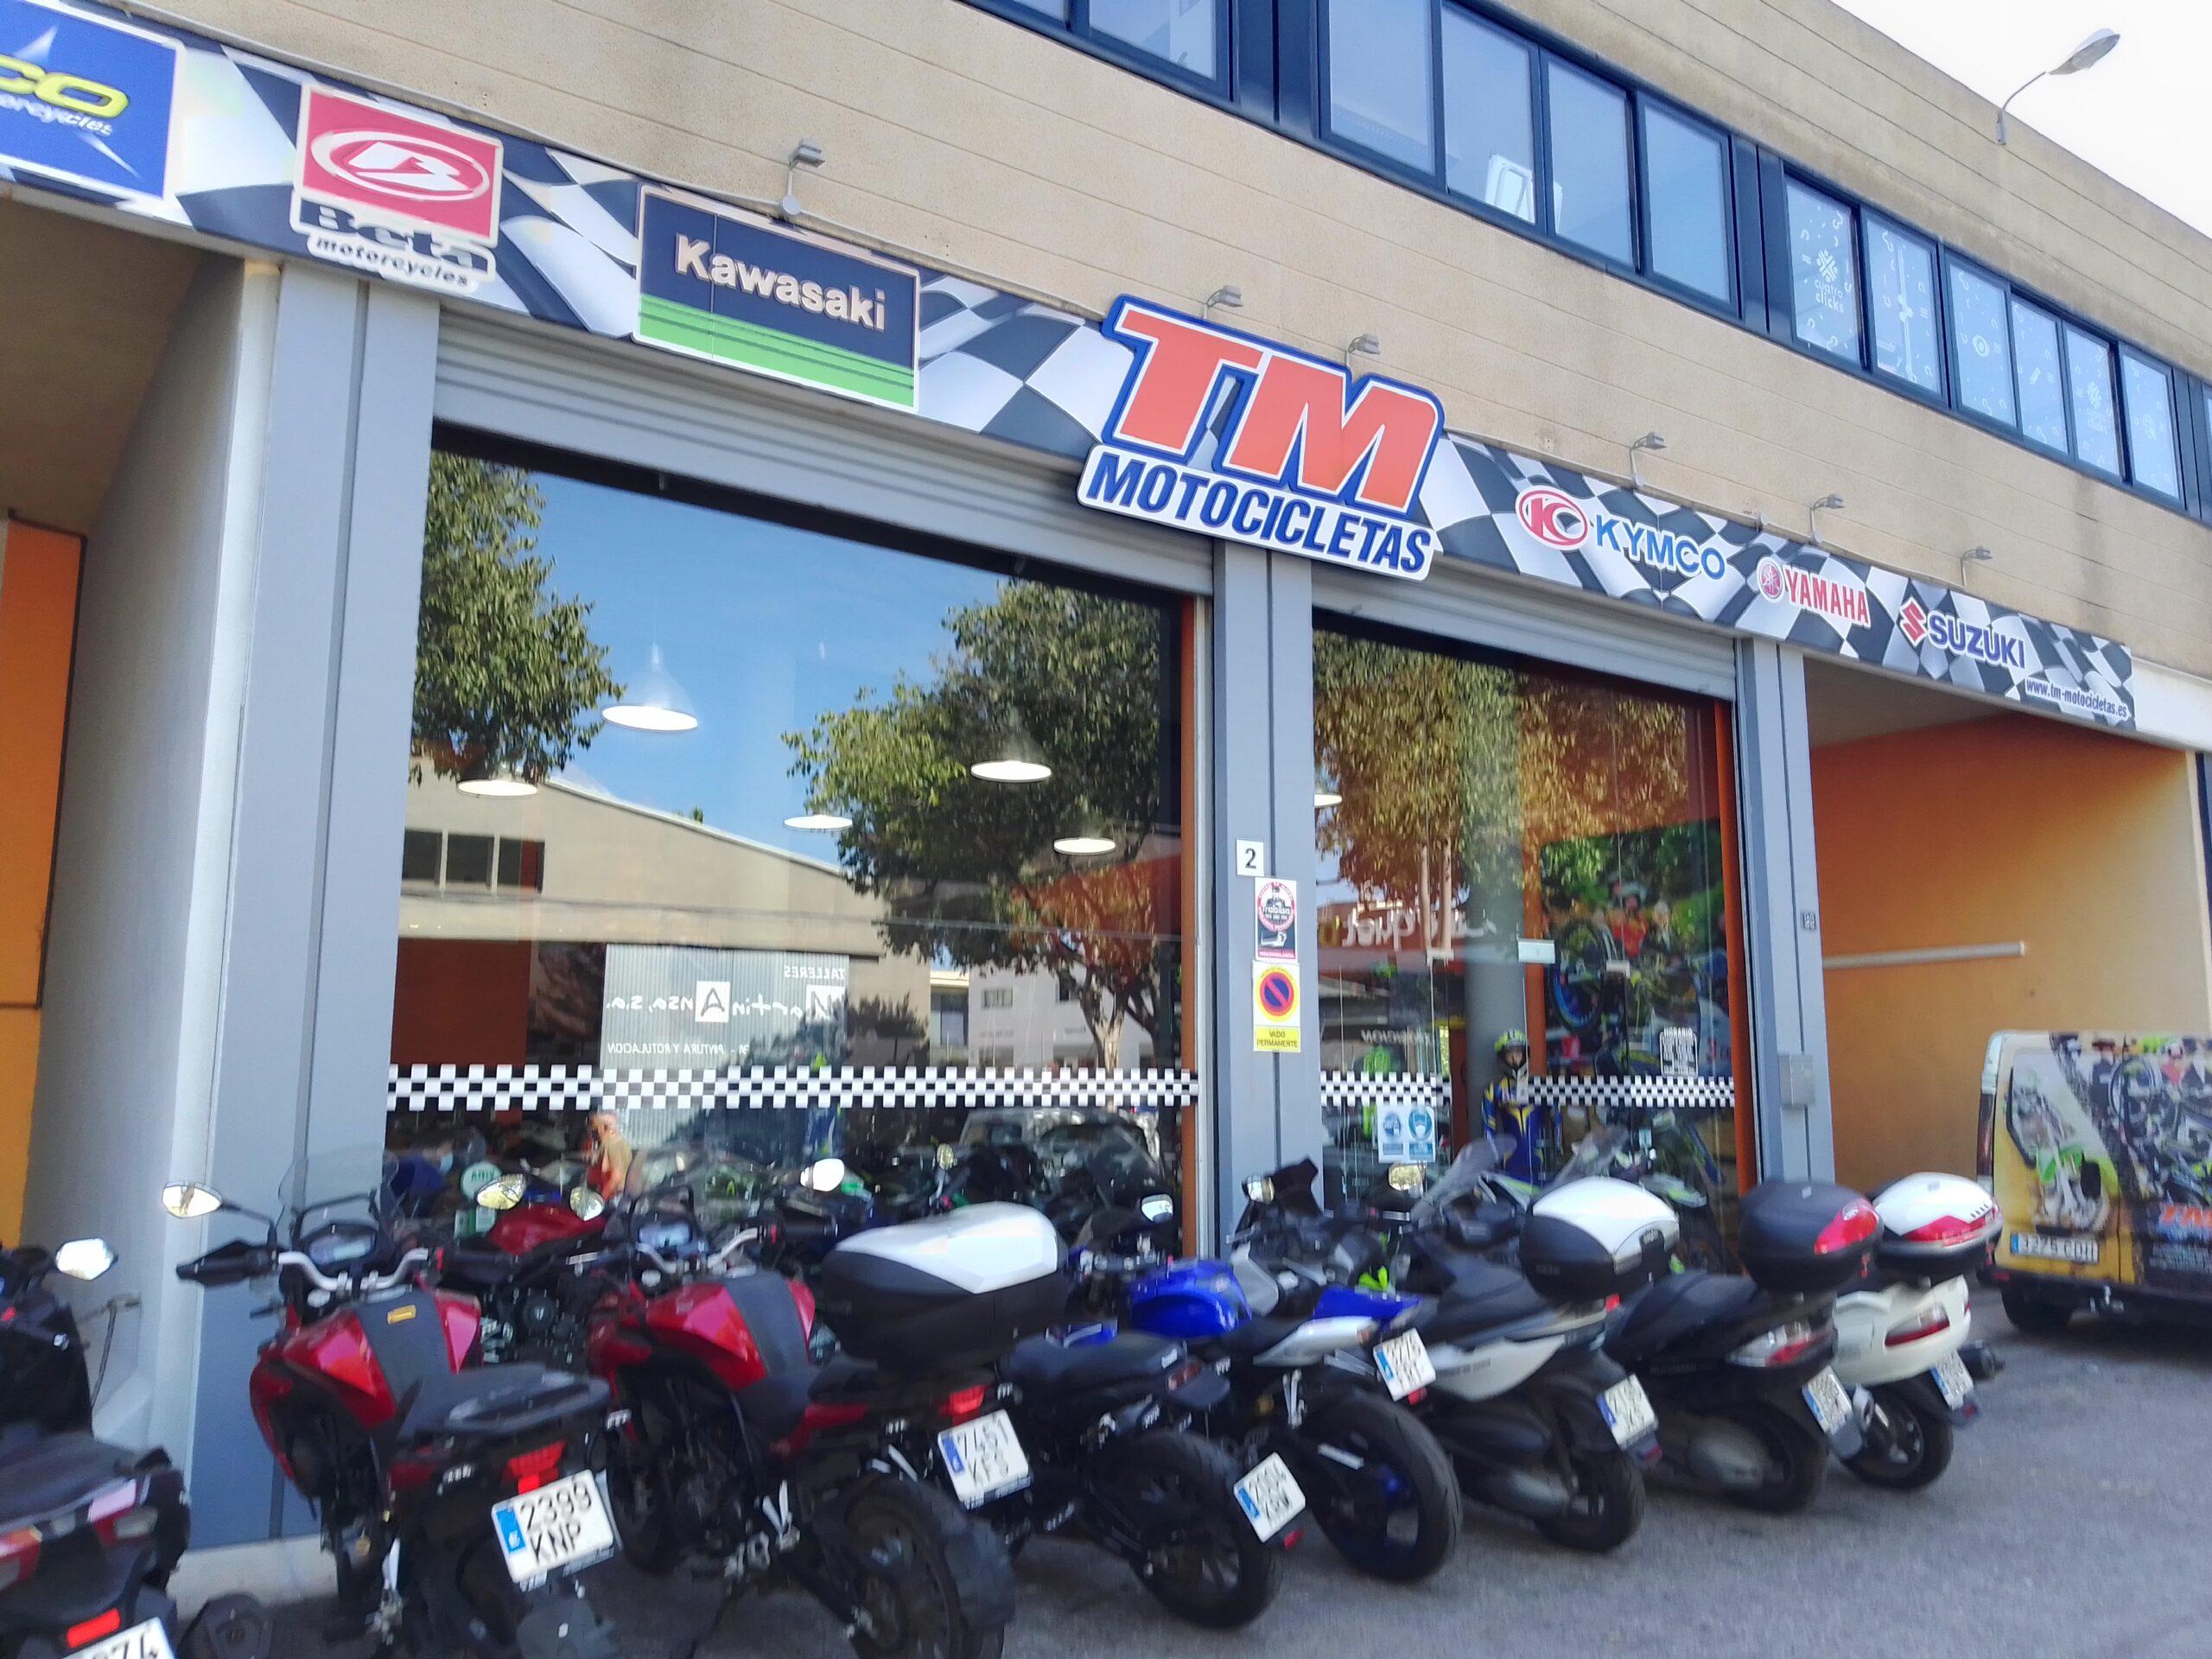 TM motocicletas